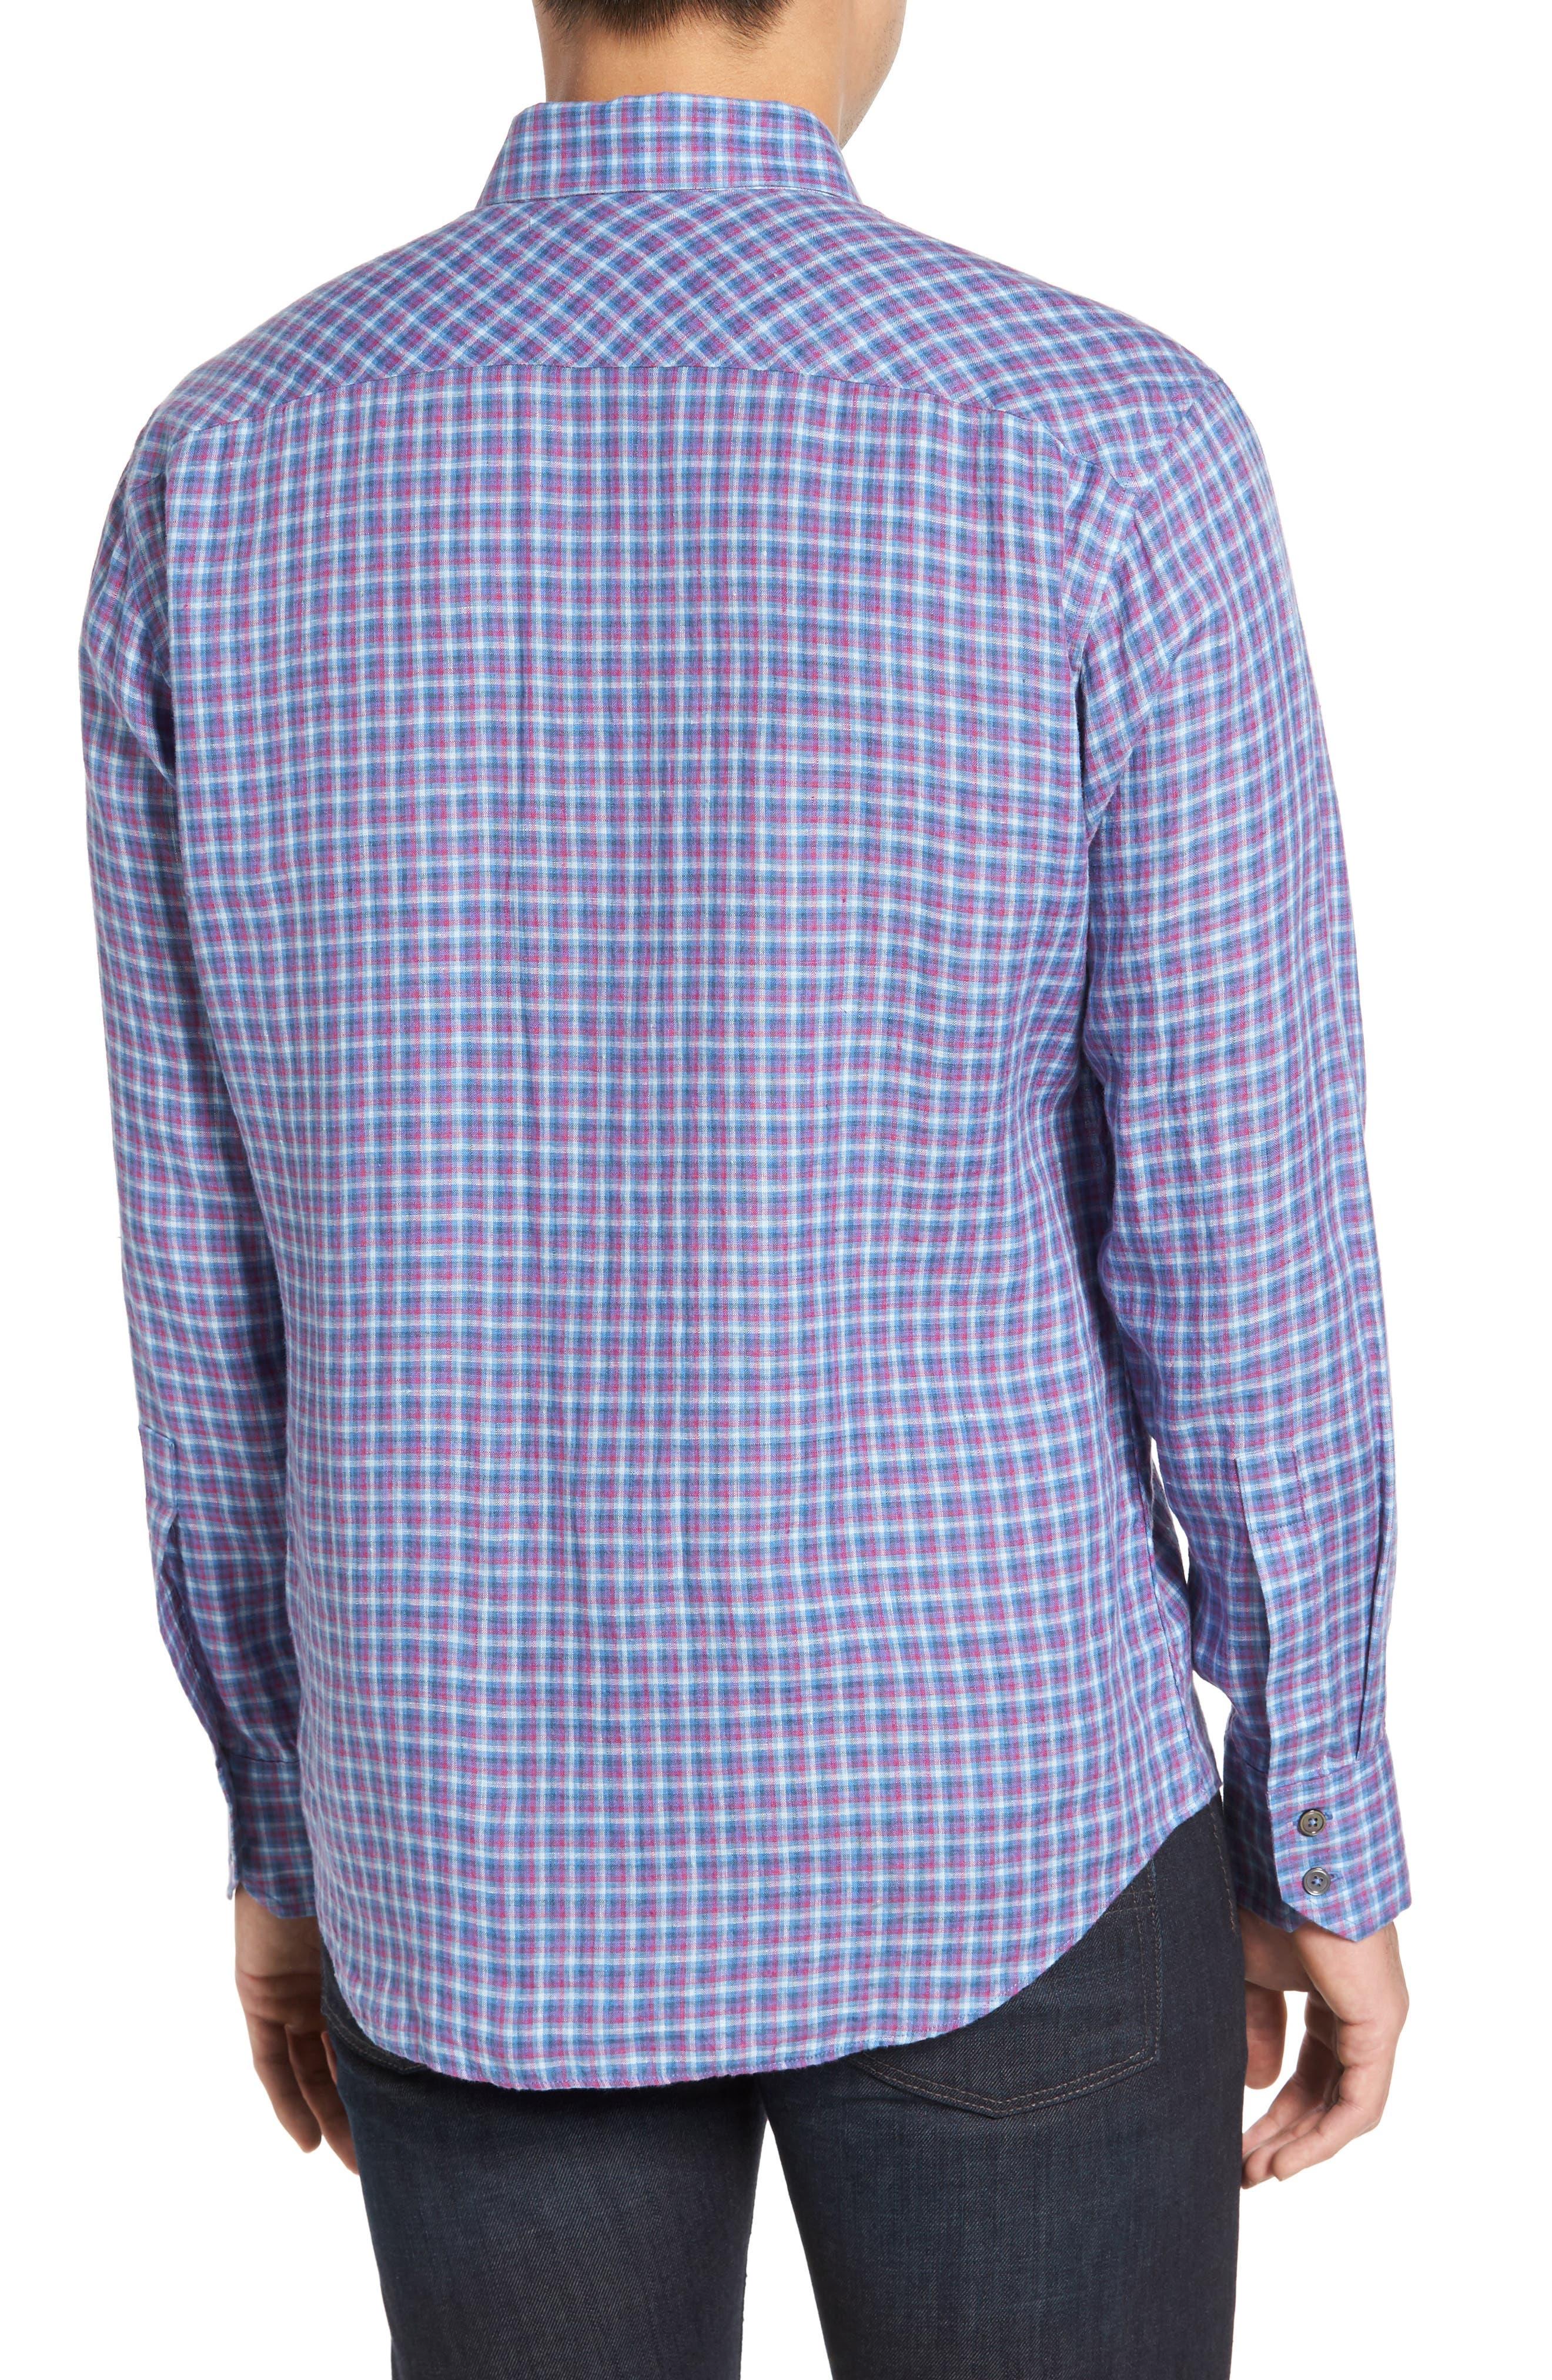 ZACHARY PRELL, Althoff Regular Fit Plaid Linen Sport Shirt, Alternate thumbnail 2, color, AZURE